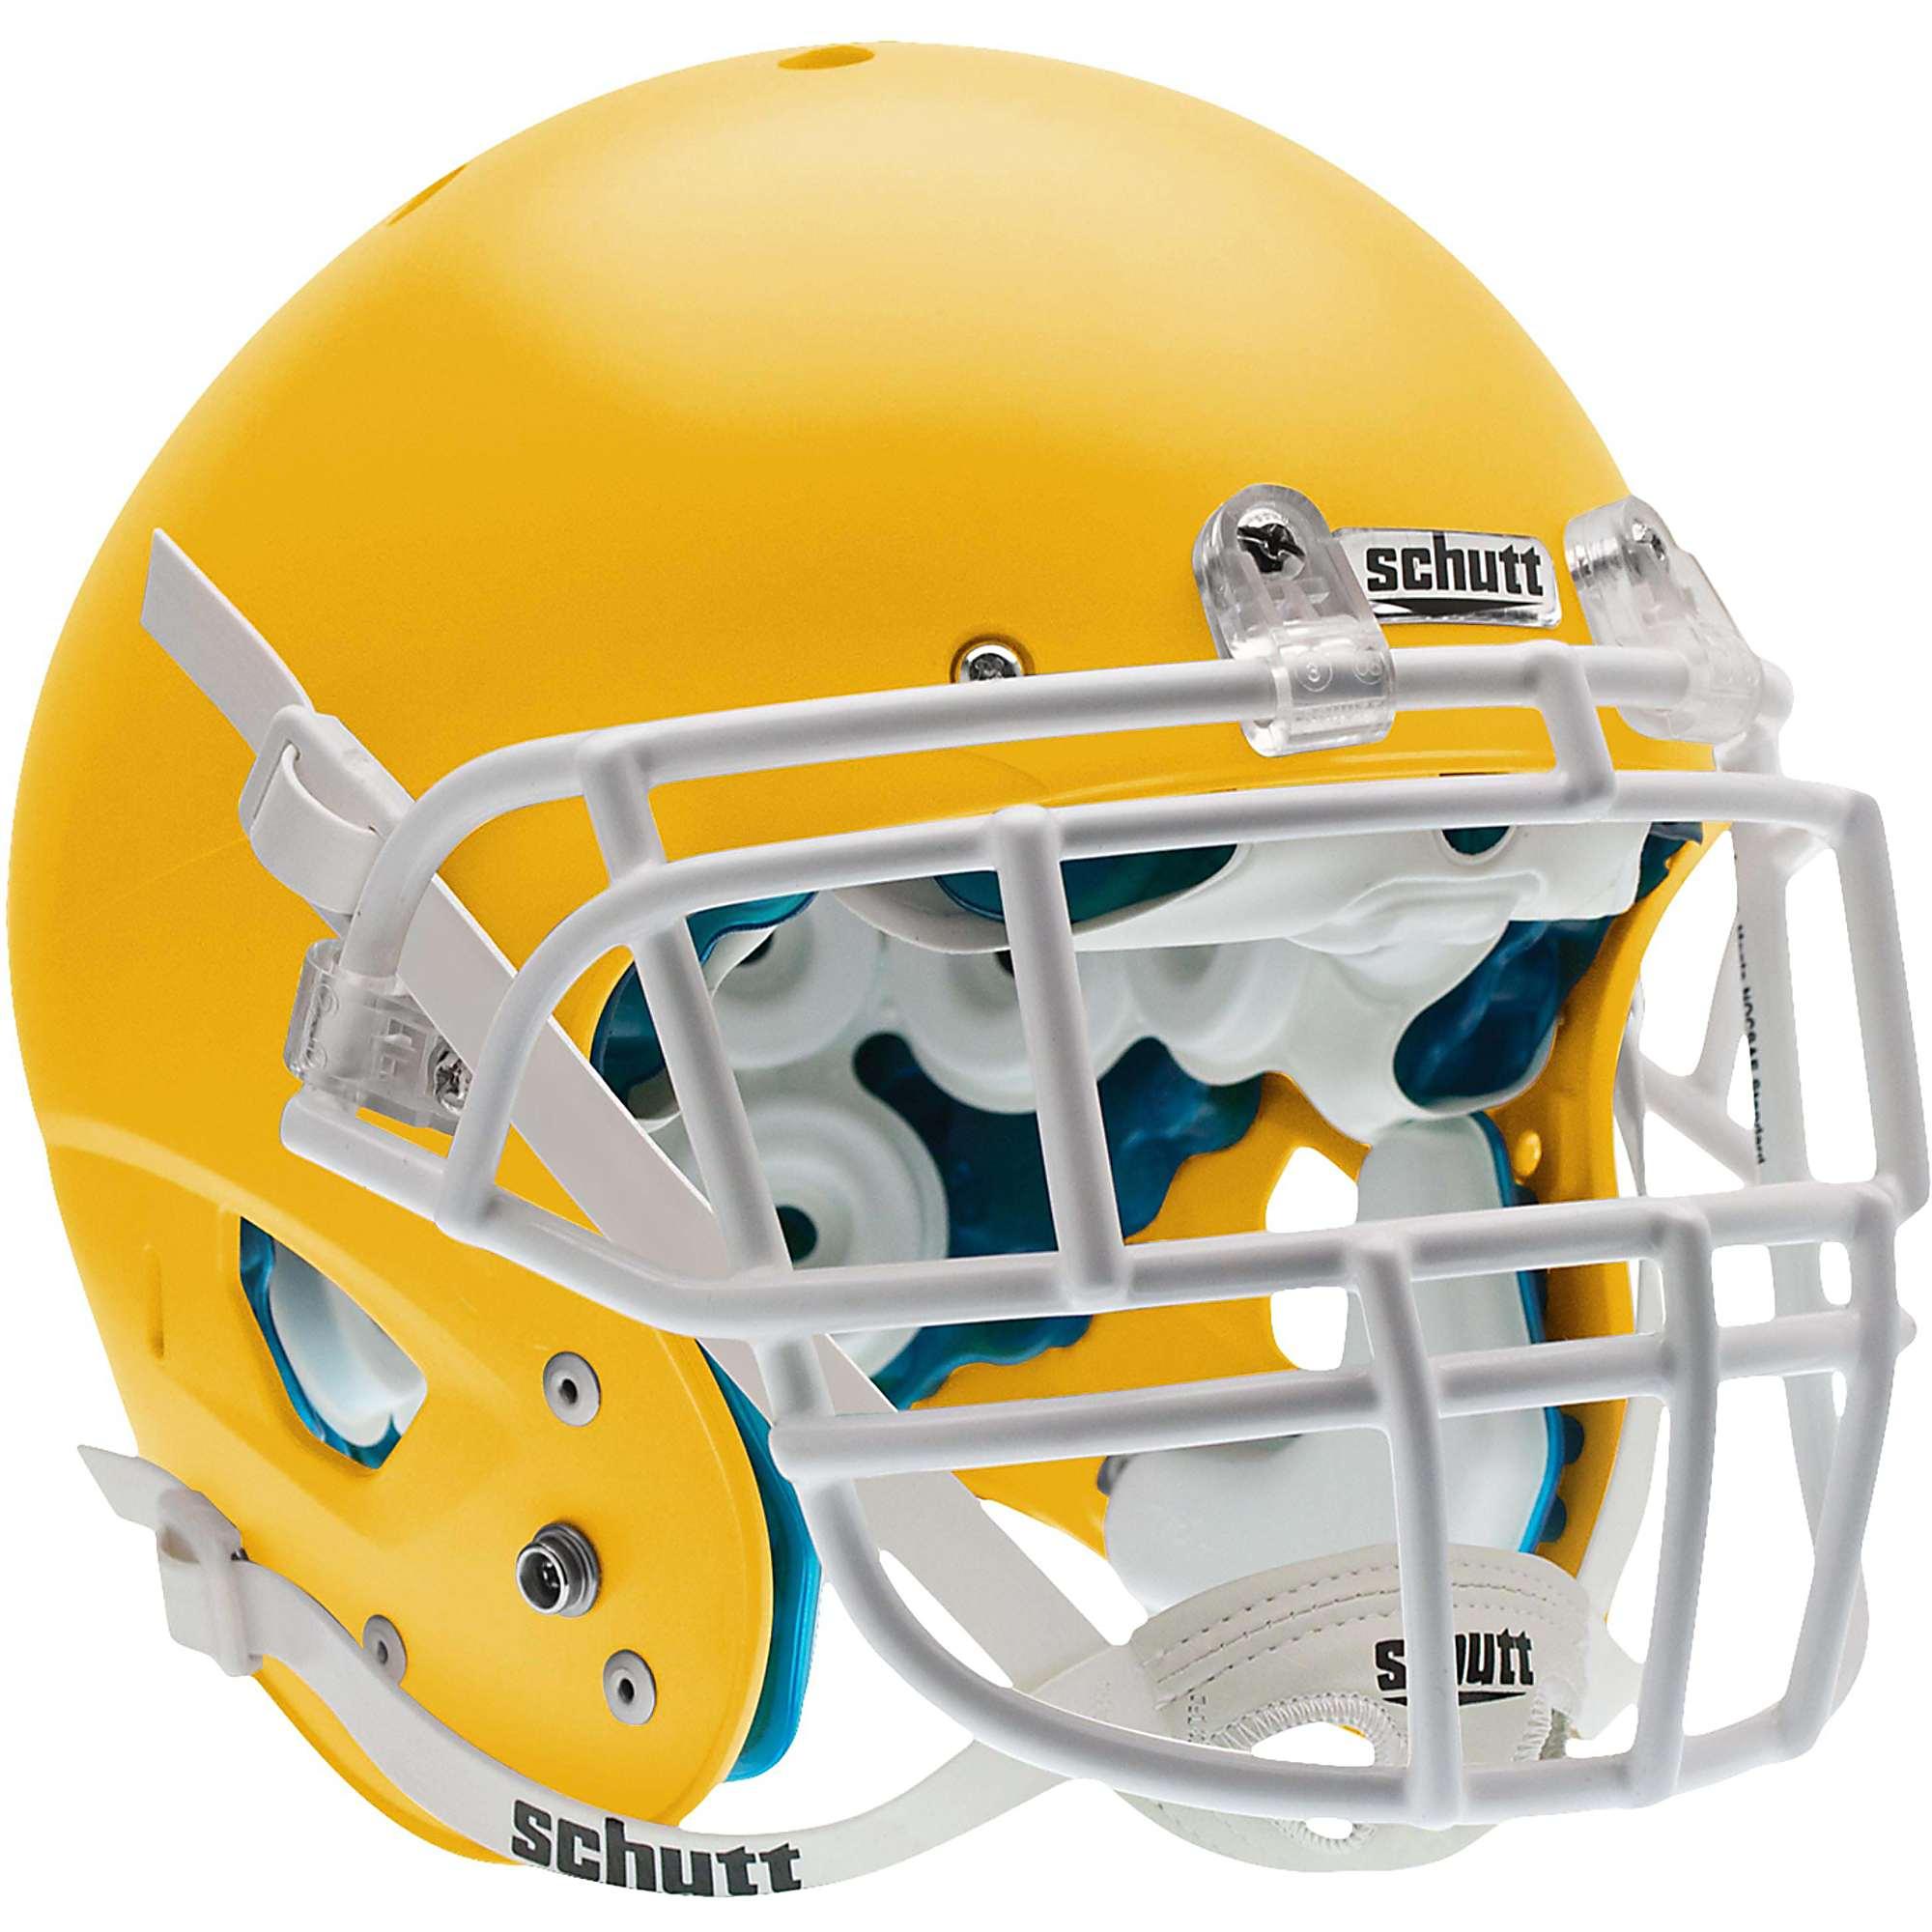 Schutt Youth Air Xp Ultra-Lite Football Helmet | eBay